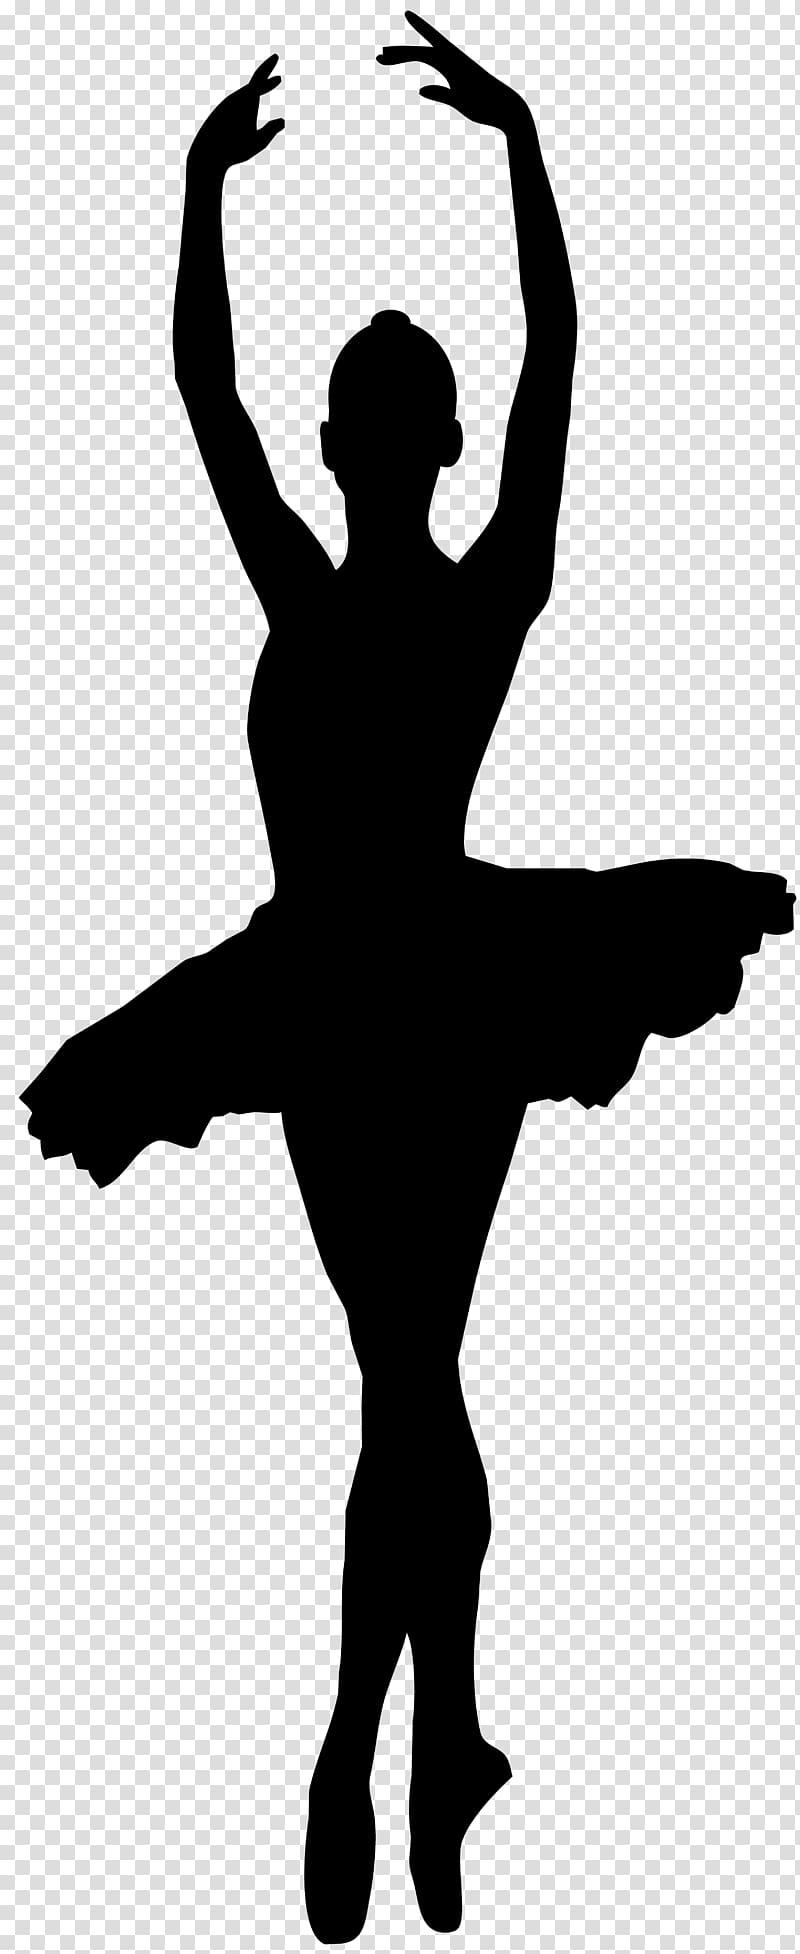 Illustration paris opera ballet. Ballerina clipart transparent background